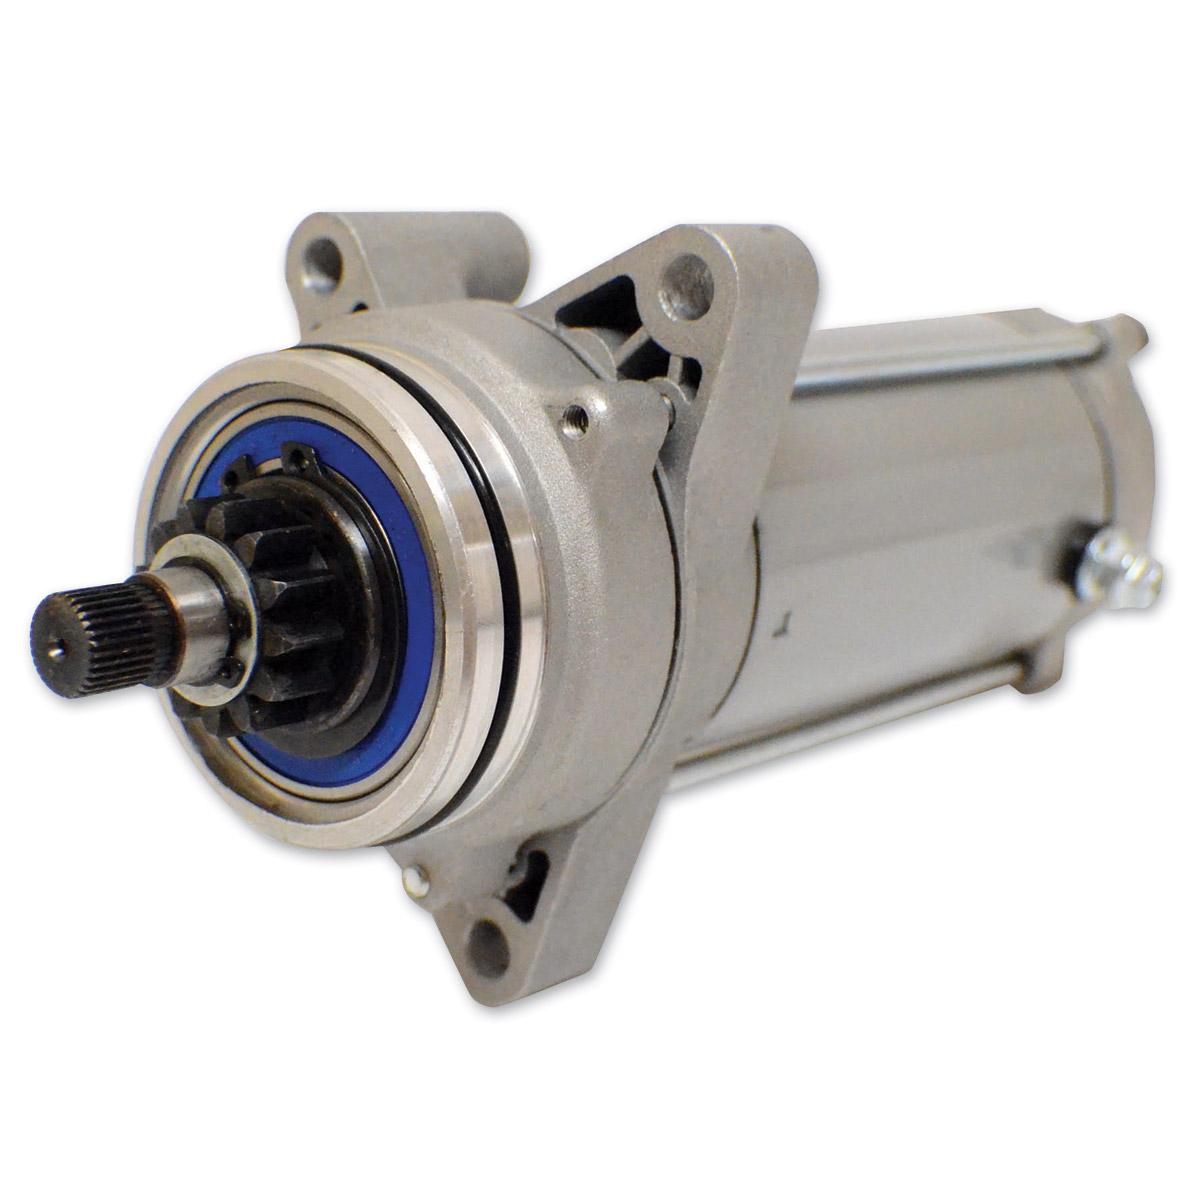 700r torque converter wiring diagram pro torque starter wiring diagram protorque motorcycle starter - ph125-hn17 | jpcycles.com